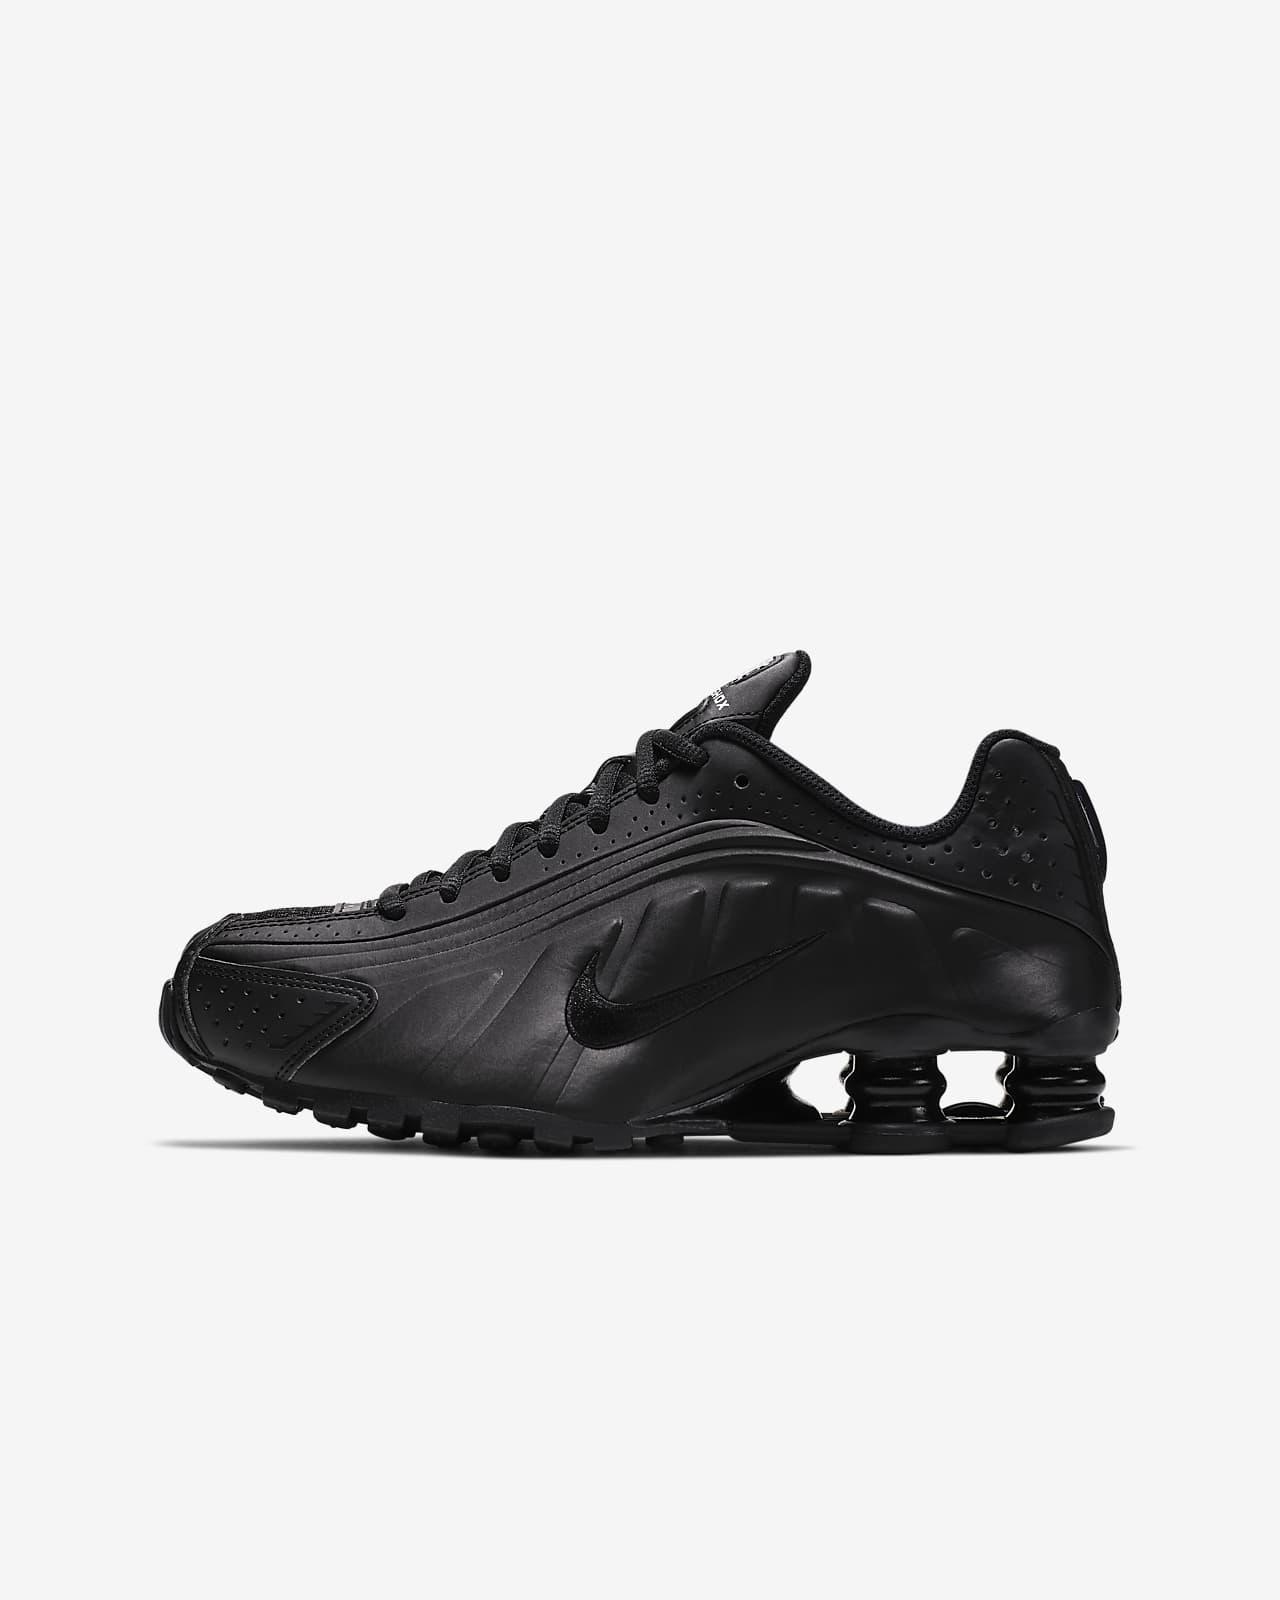 Sko Nike Shox R4 för ungdom